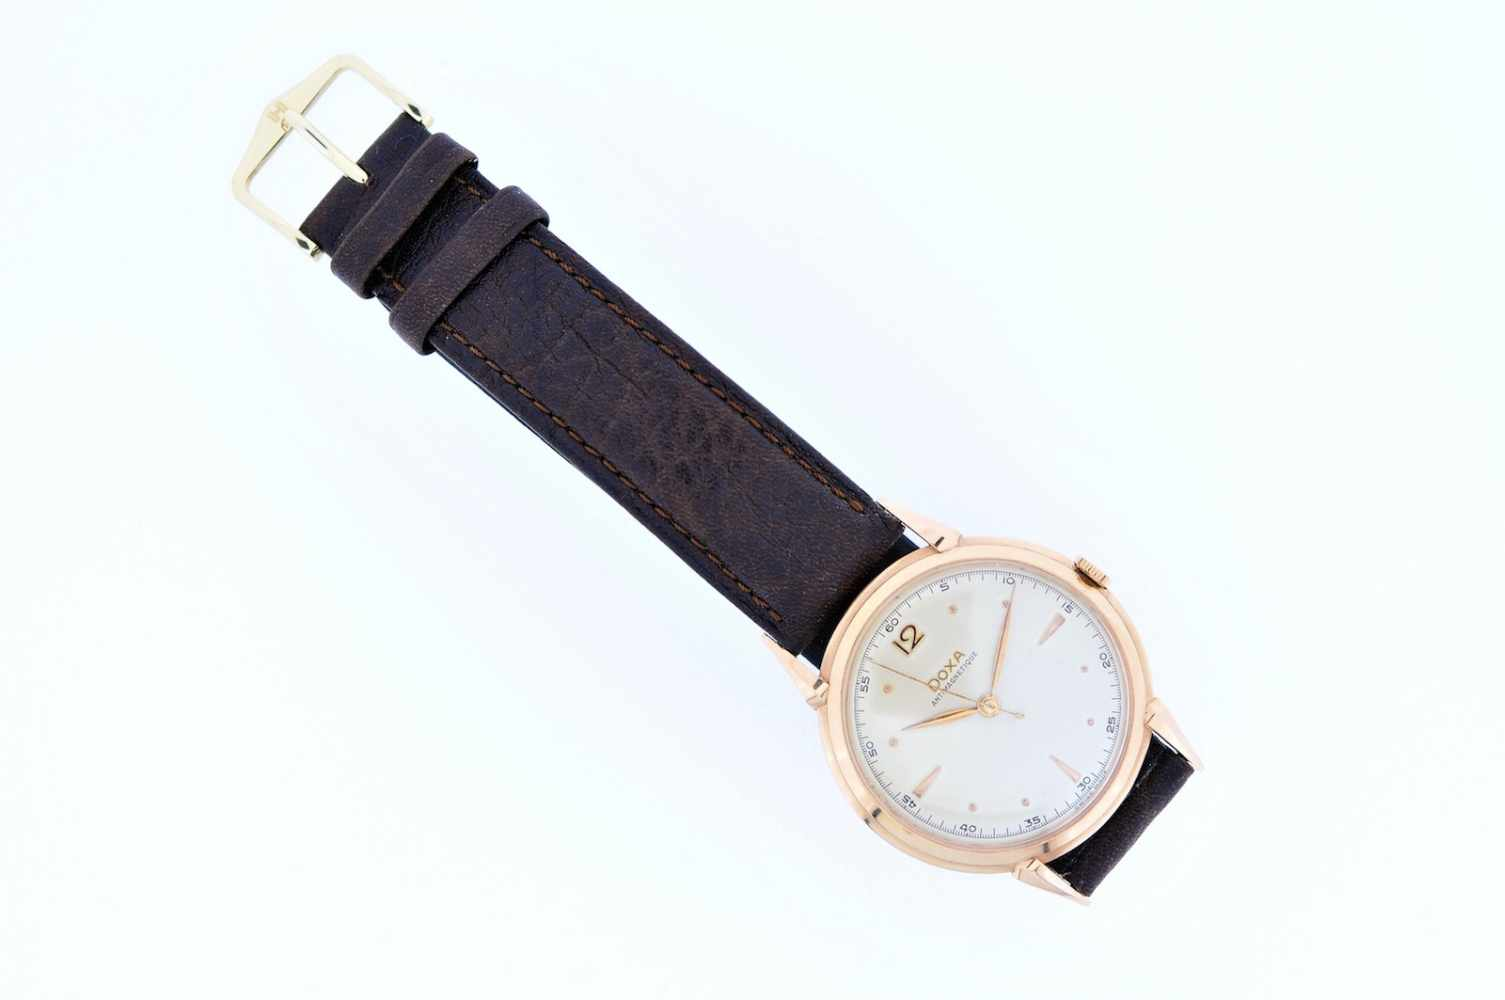 Doxa Roségoldene Armbanduhr an Lederband, Doxa Antimagnetique, Handaufzug, Ankerwerk,